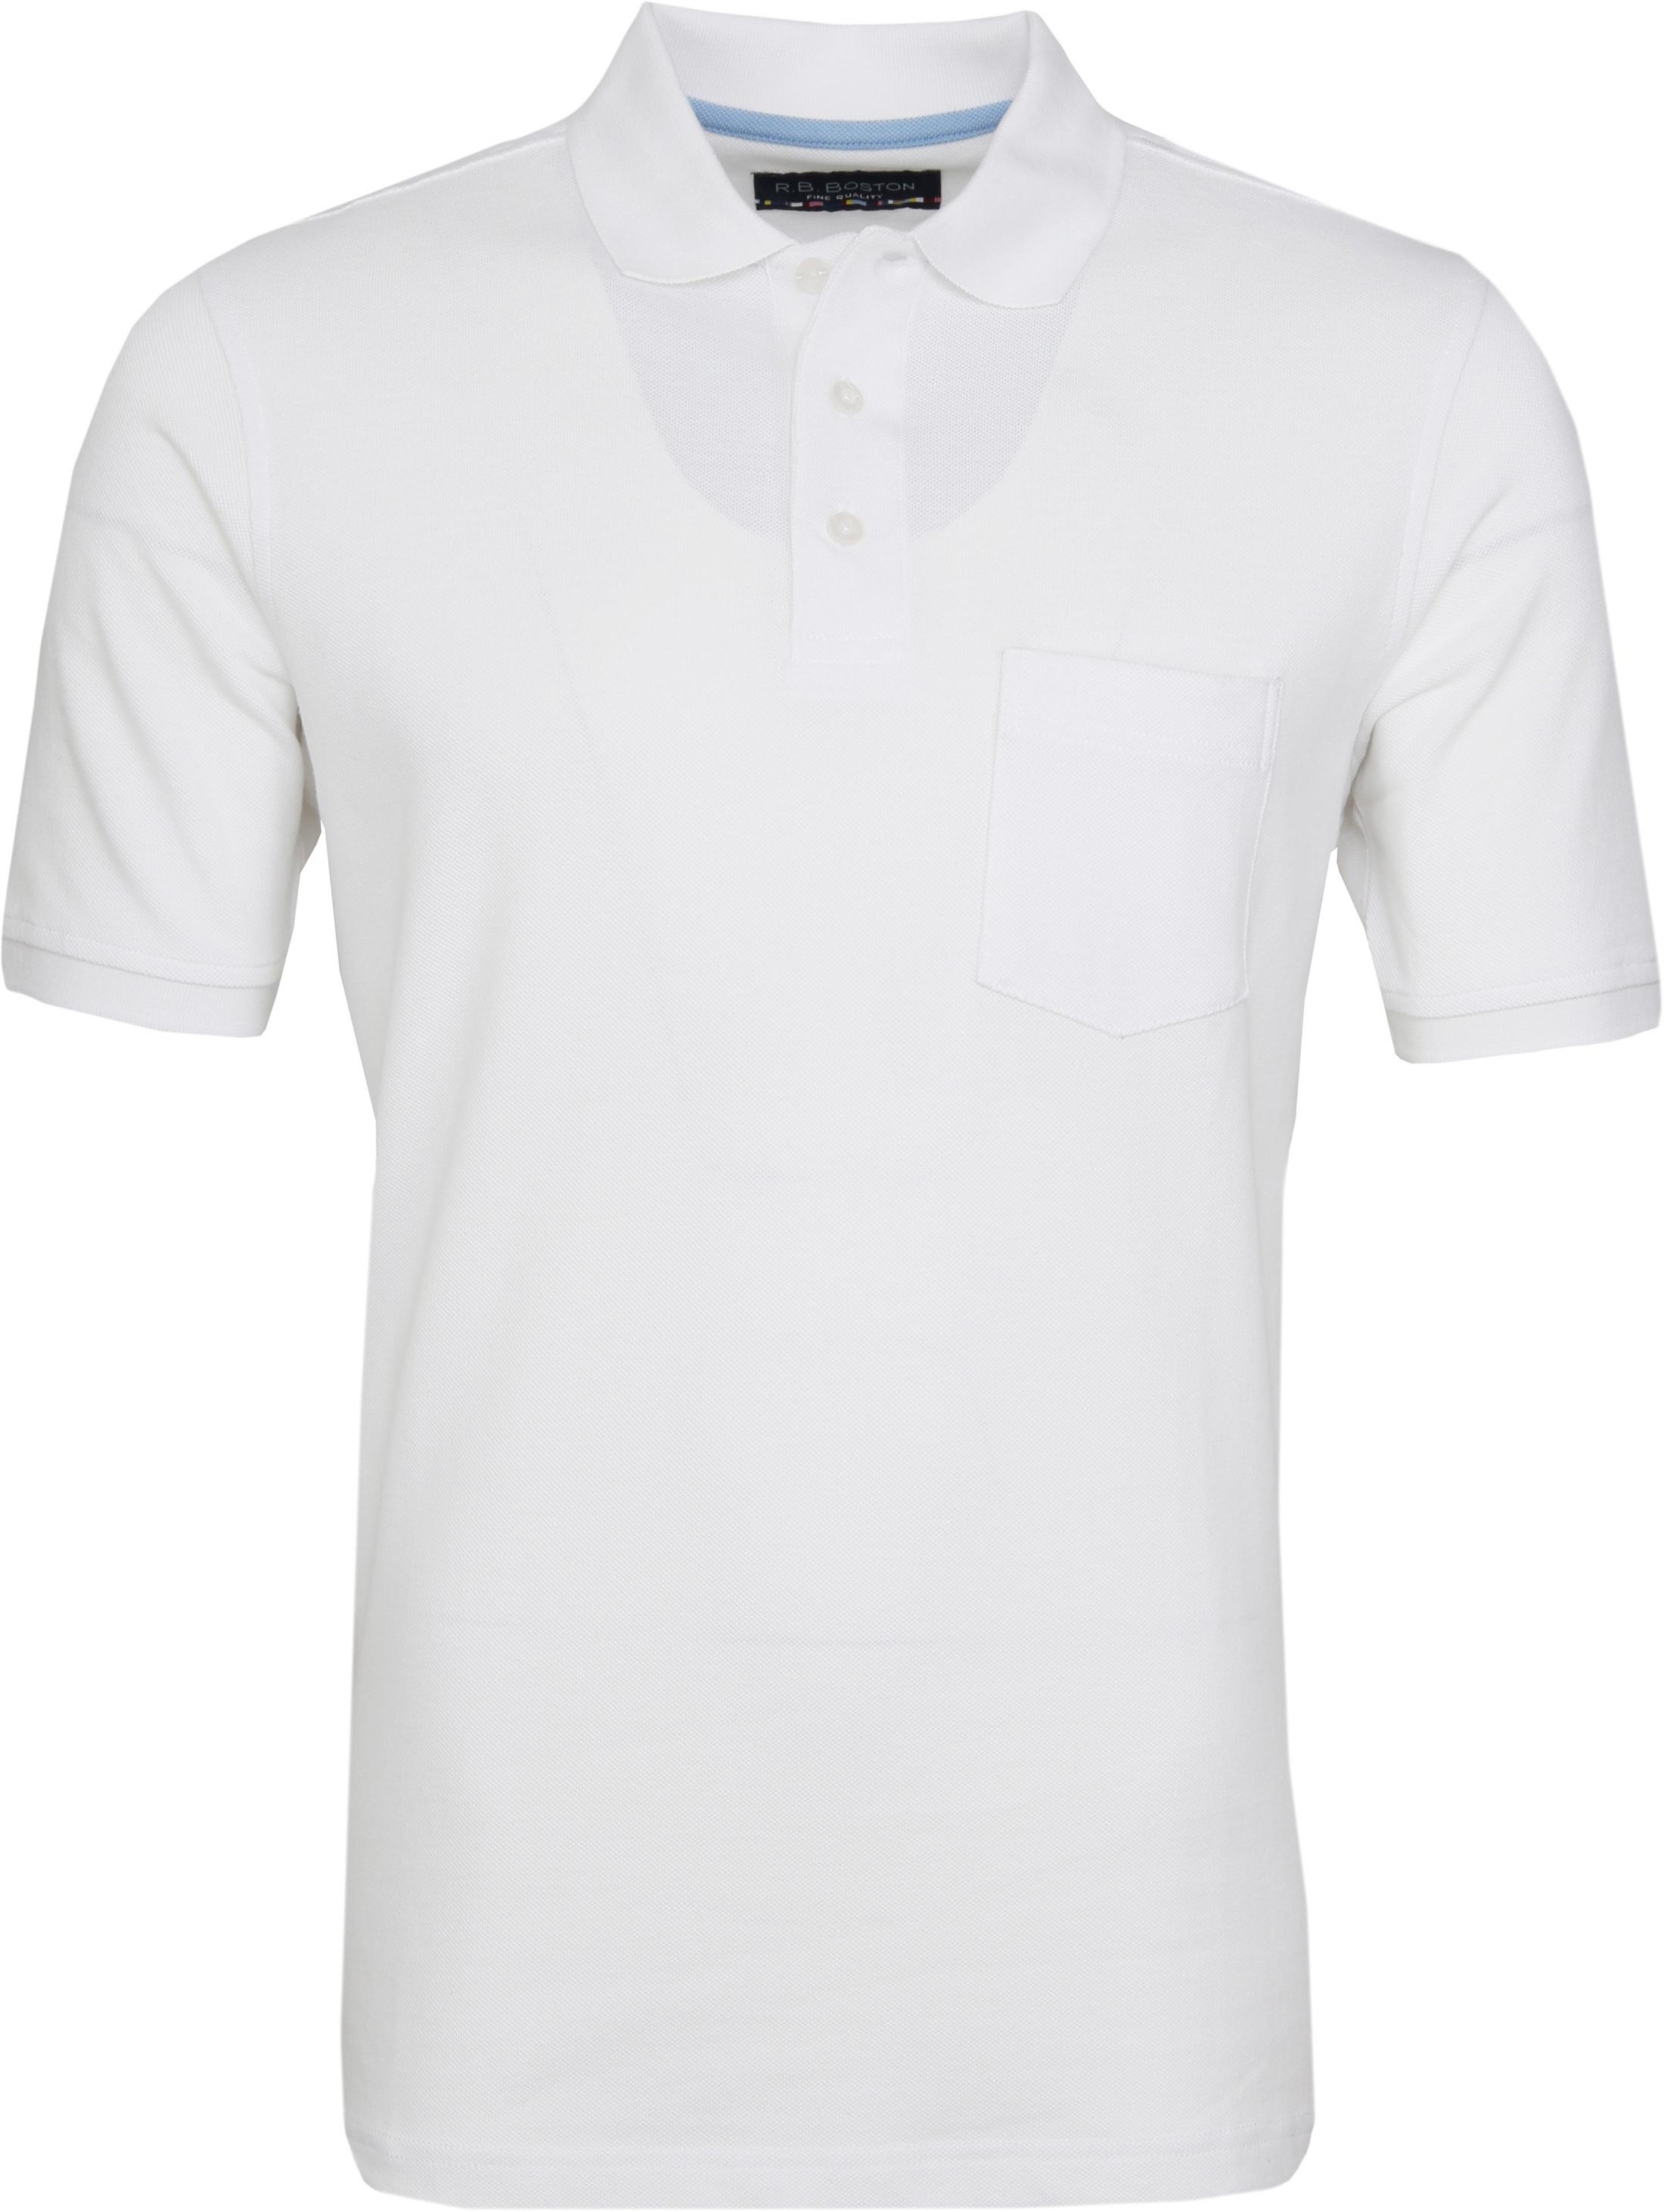 Suitable Poloshirt Boston Weiß